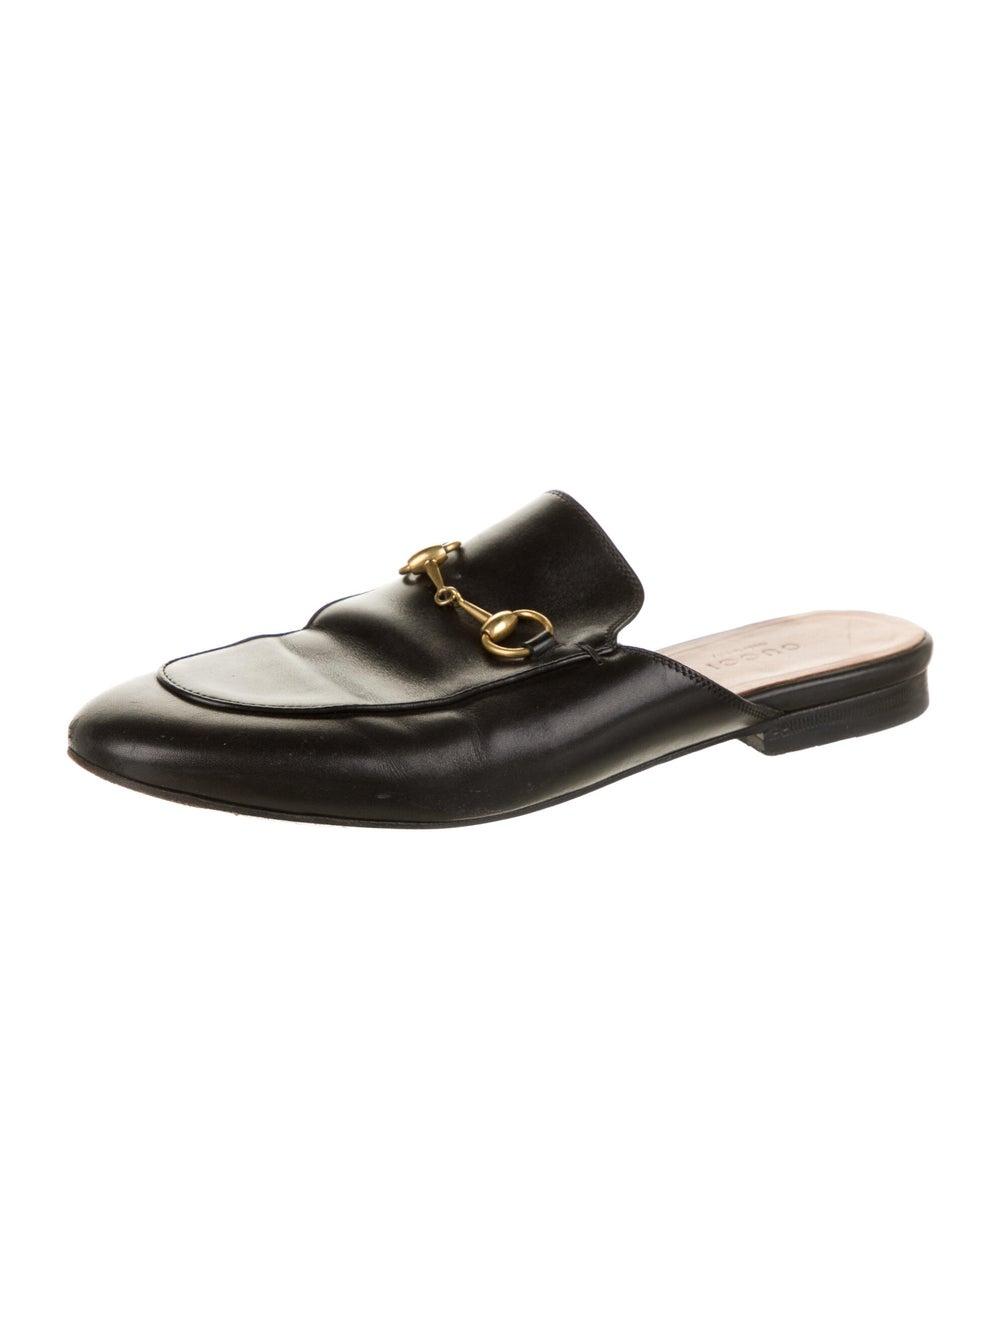 Gucci Horsebit Accent Leather Mules Black - image 2